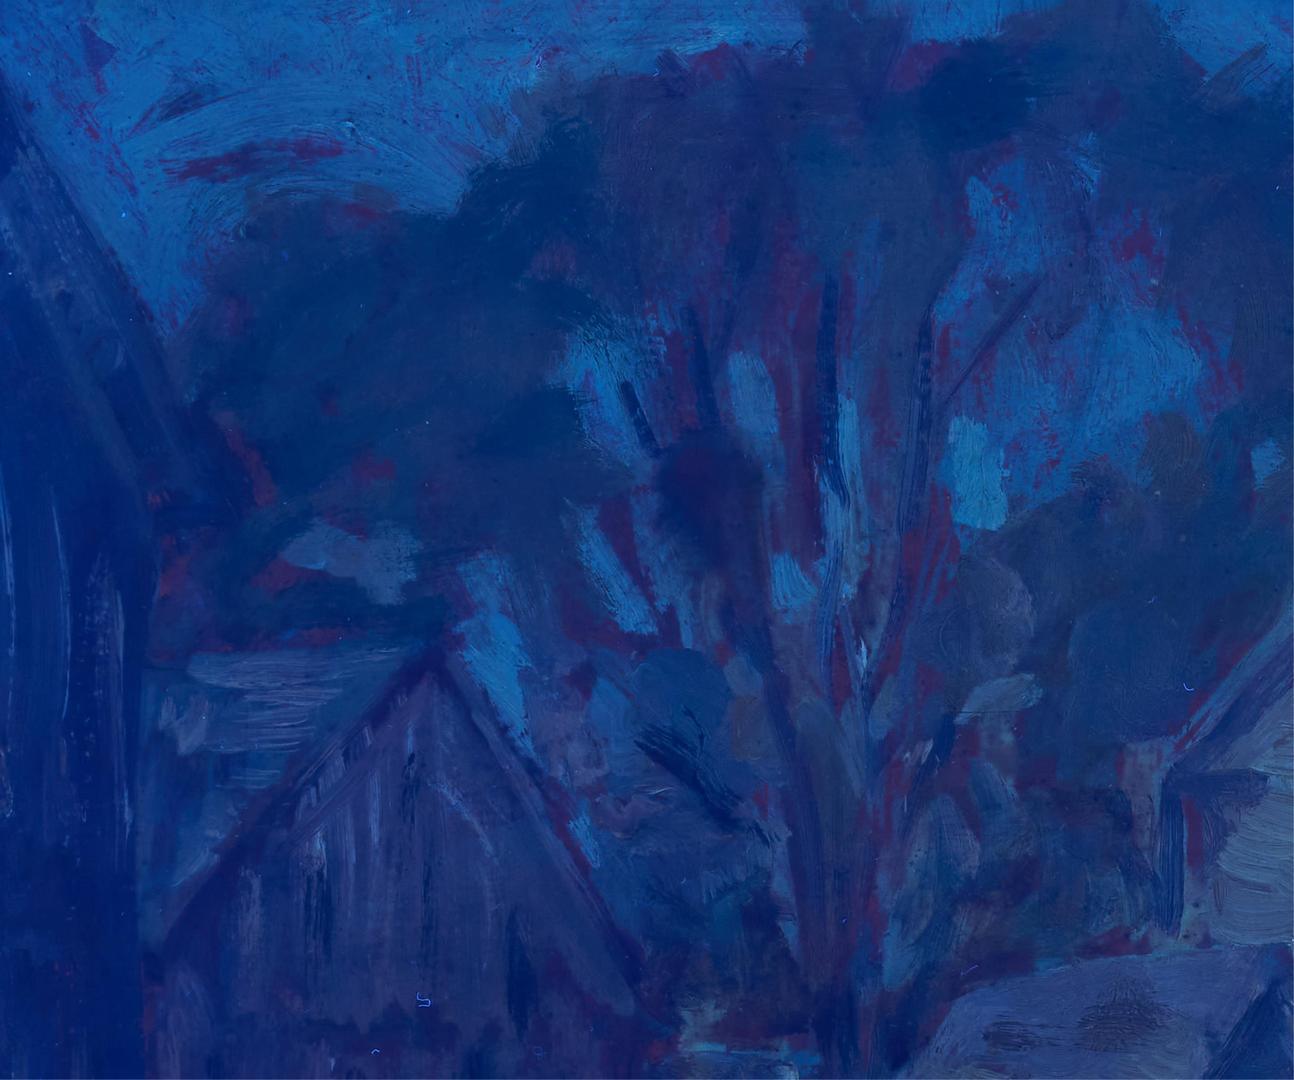 Lot 157: G. Symons O/B Landscape with Barn